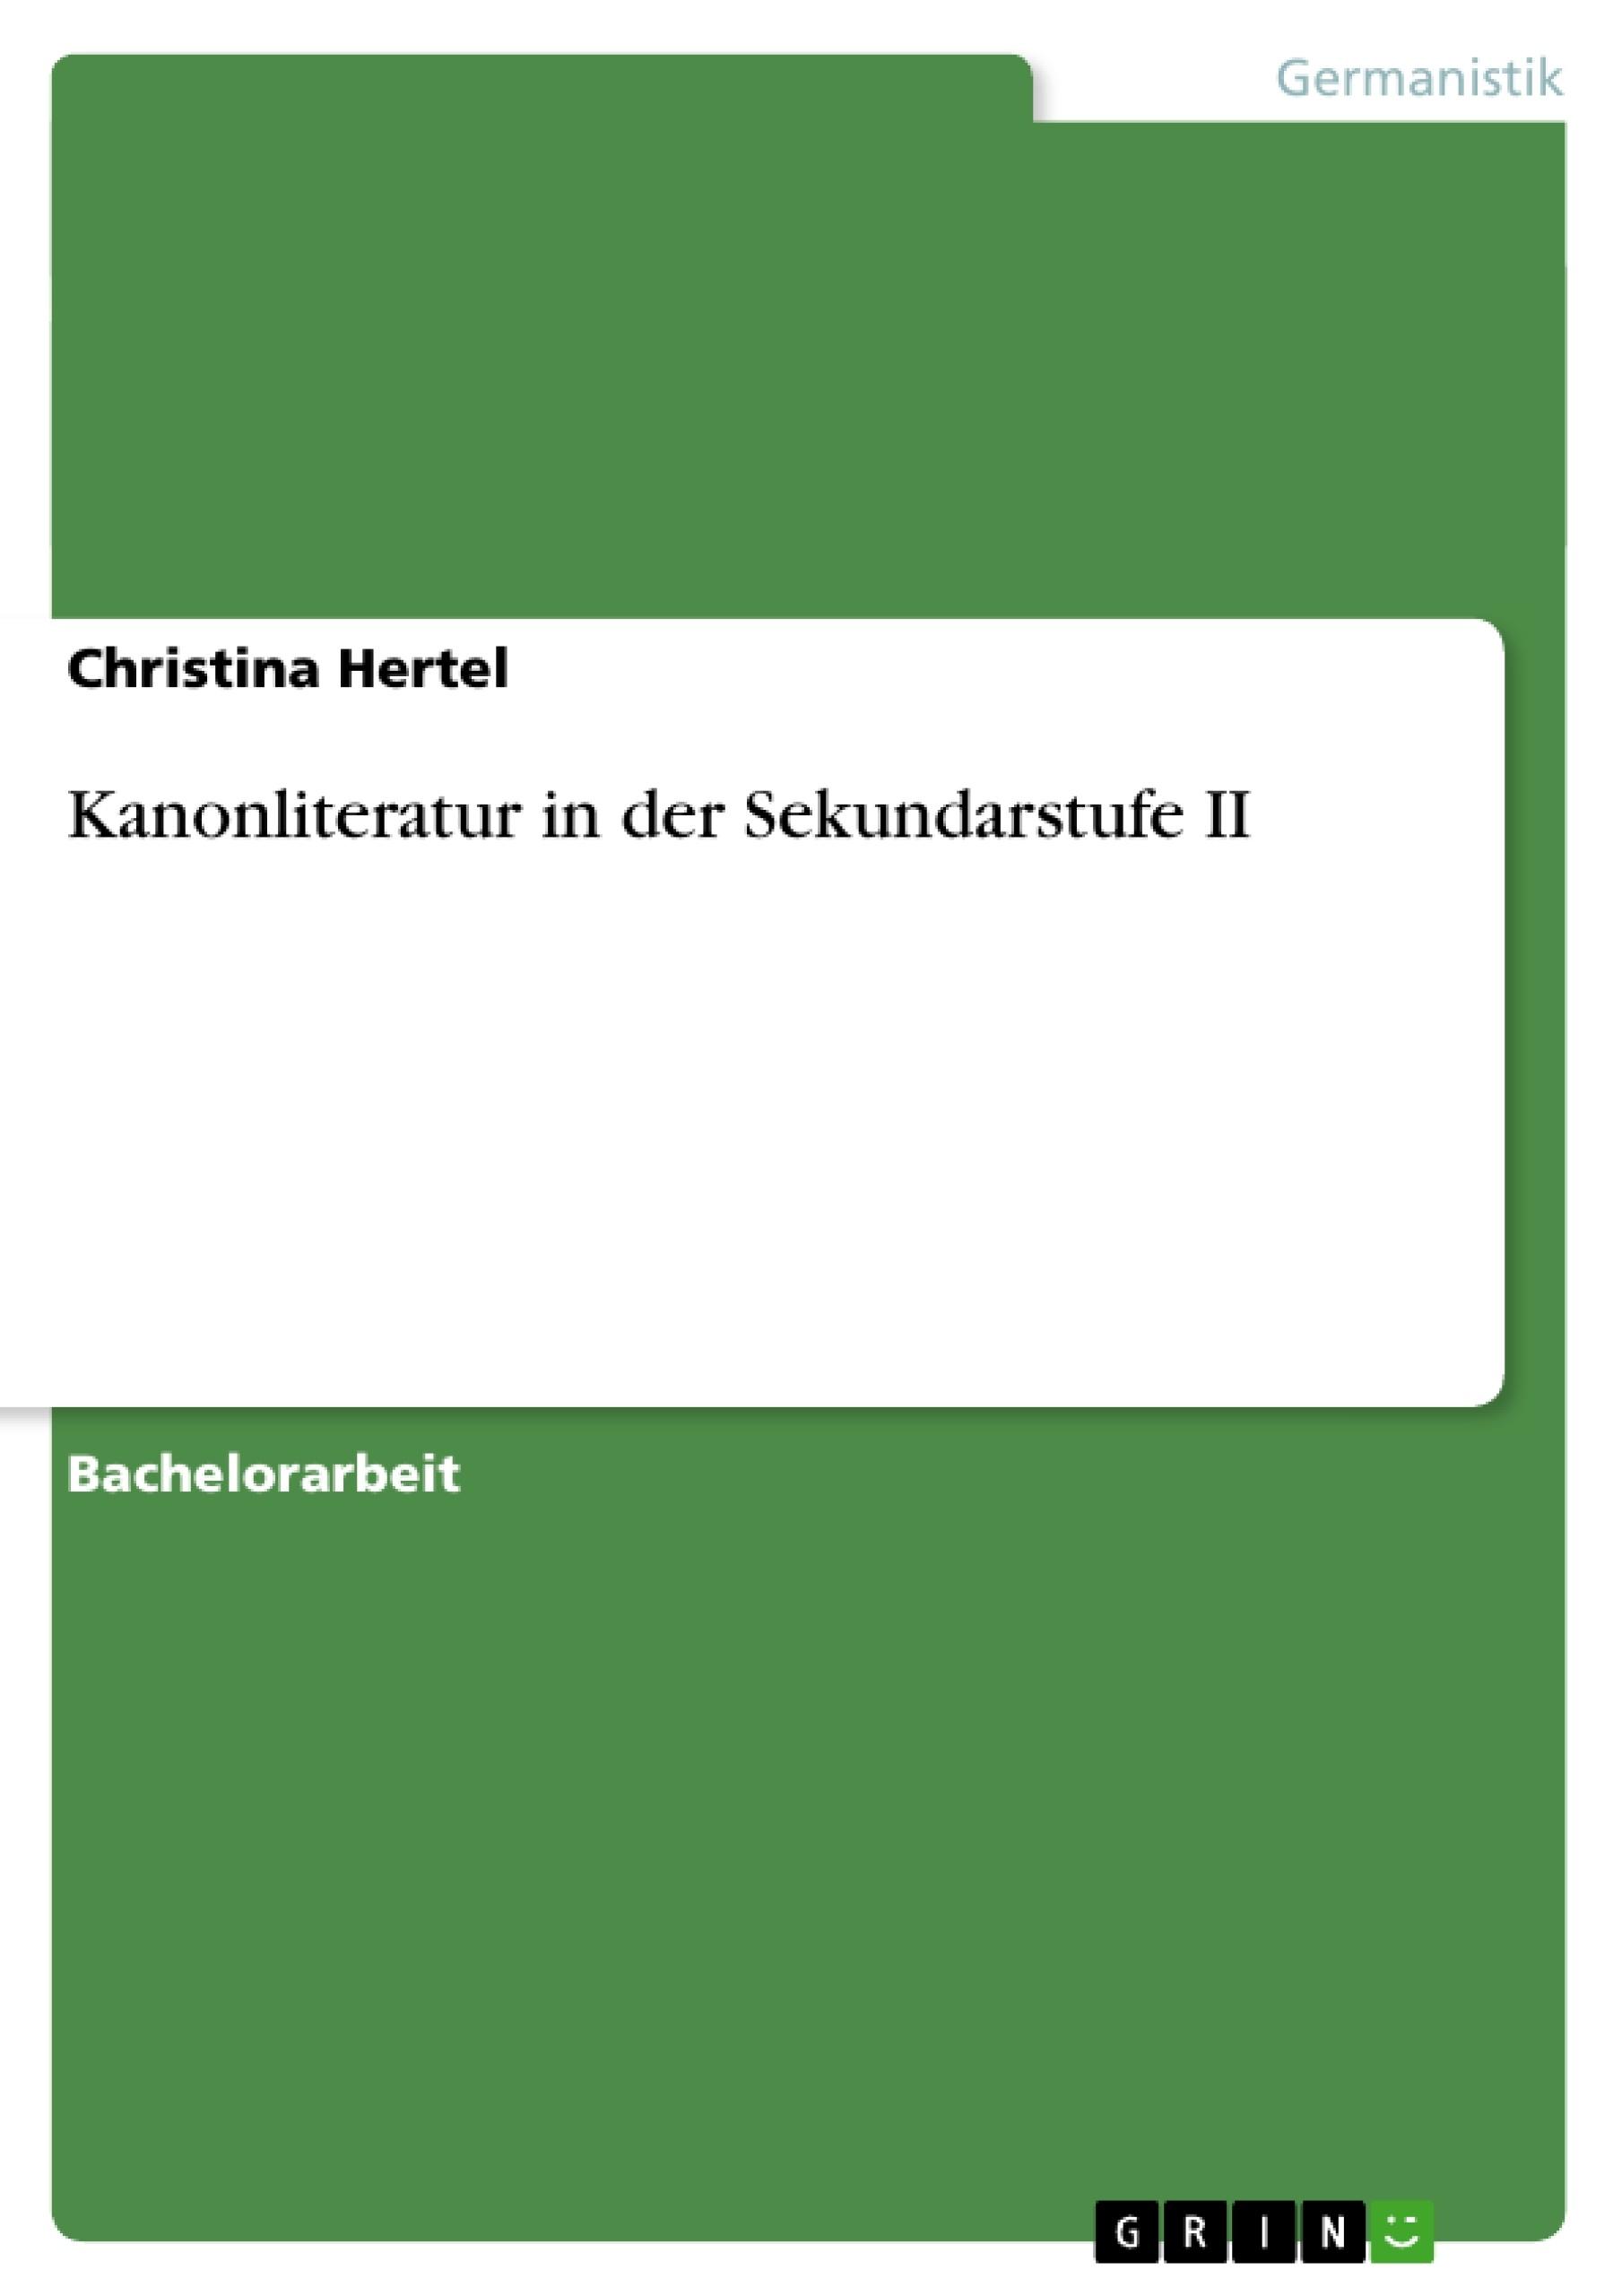 Titel: Kanonliteratur in der Sekundarstufe II